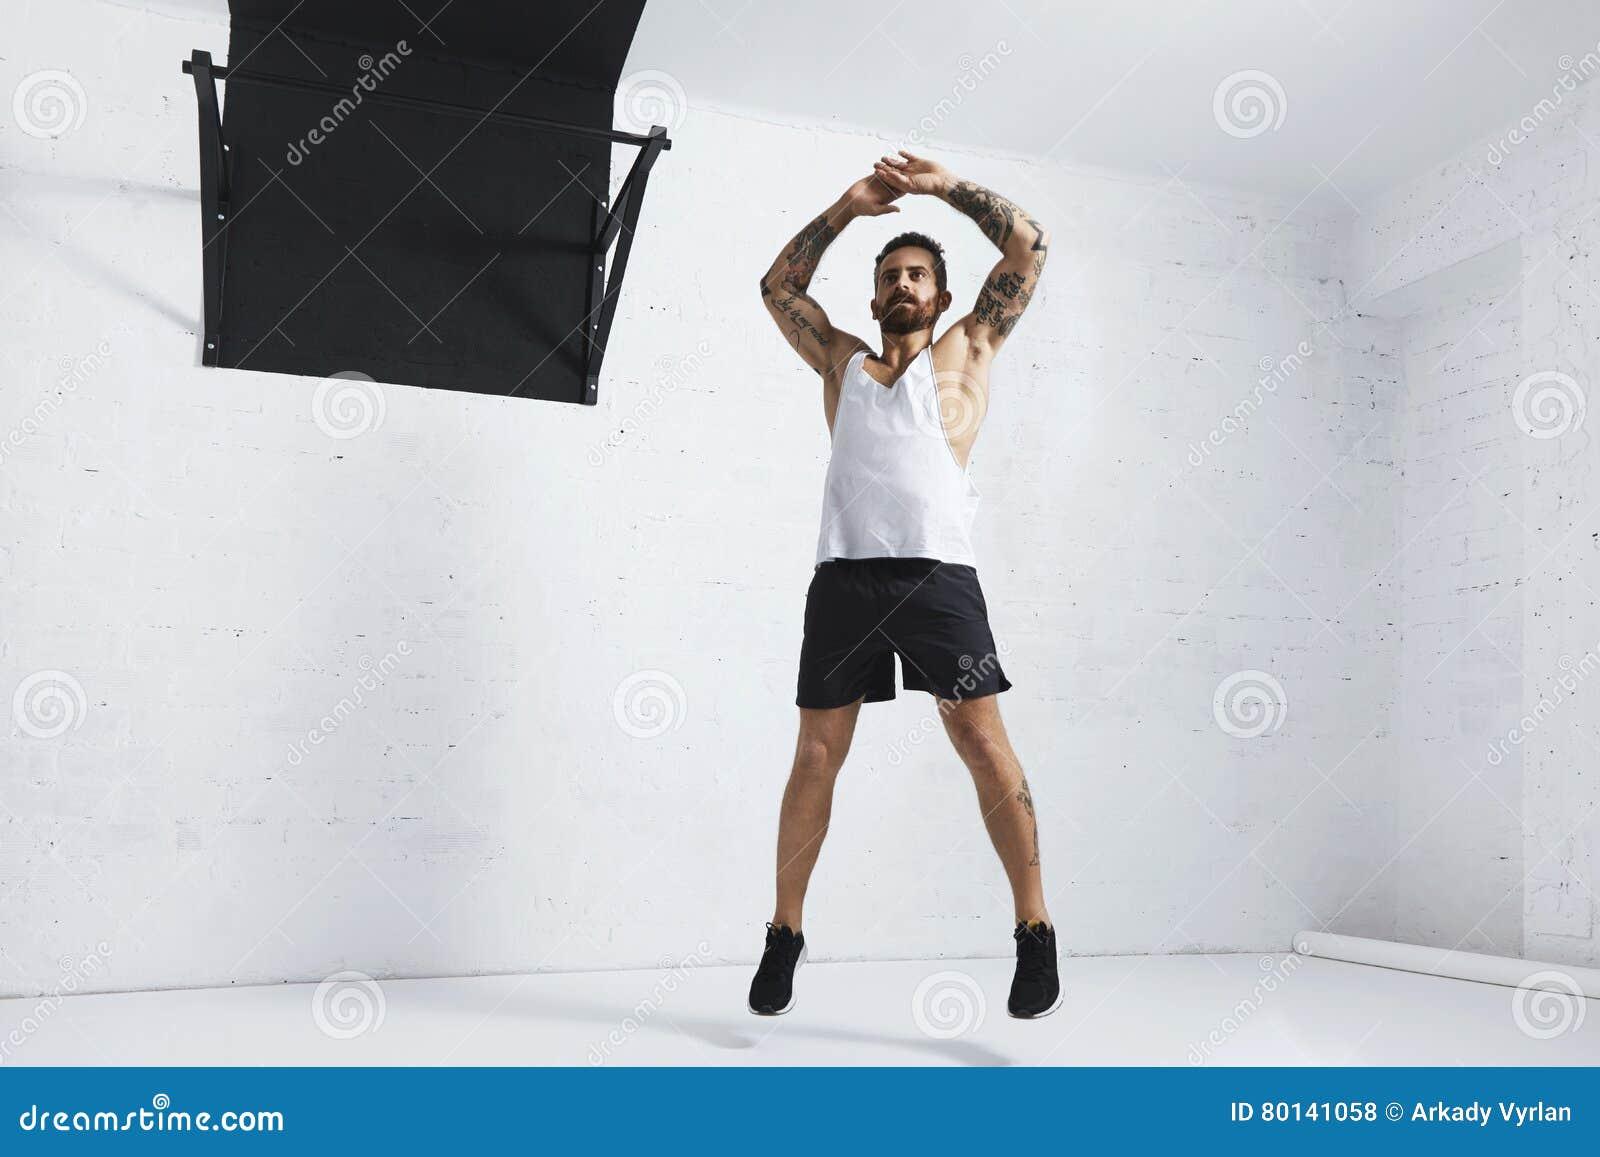 Calisthenic And Bodyweight Exercises Stock Photo - Image of activity